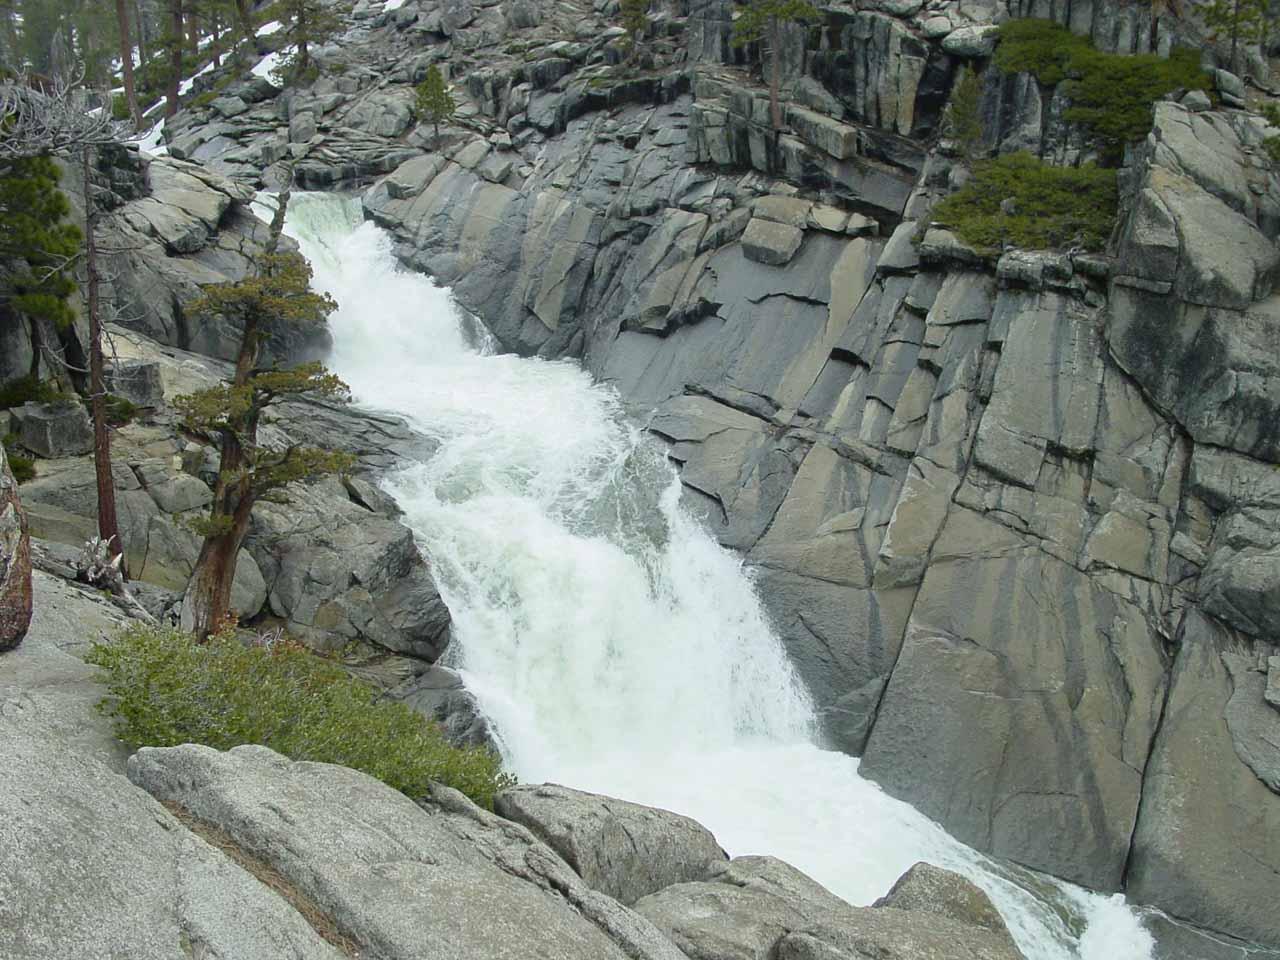 Yosemite Creek rushing towards the brink of Yosemite Falls